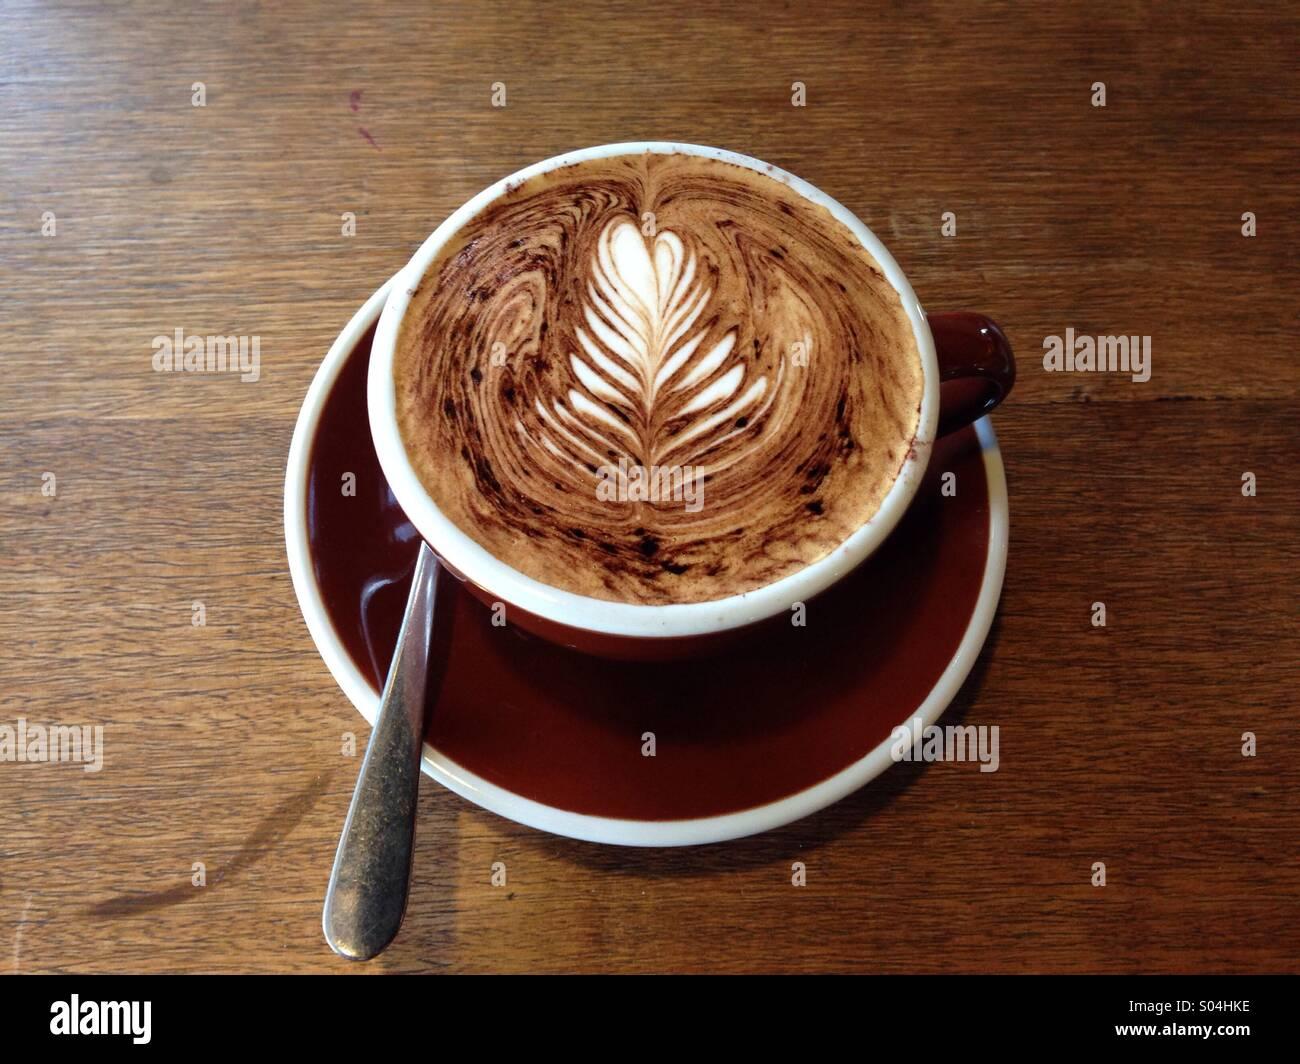 Tazza di caffè un cappuccino in un caffè Foto Stock